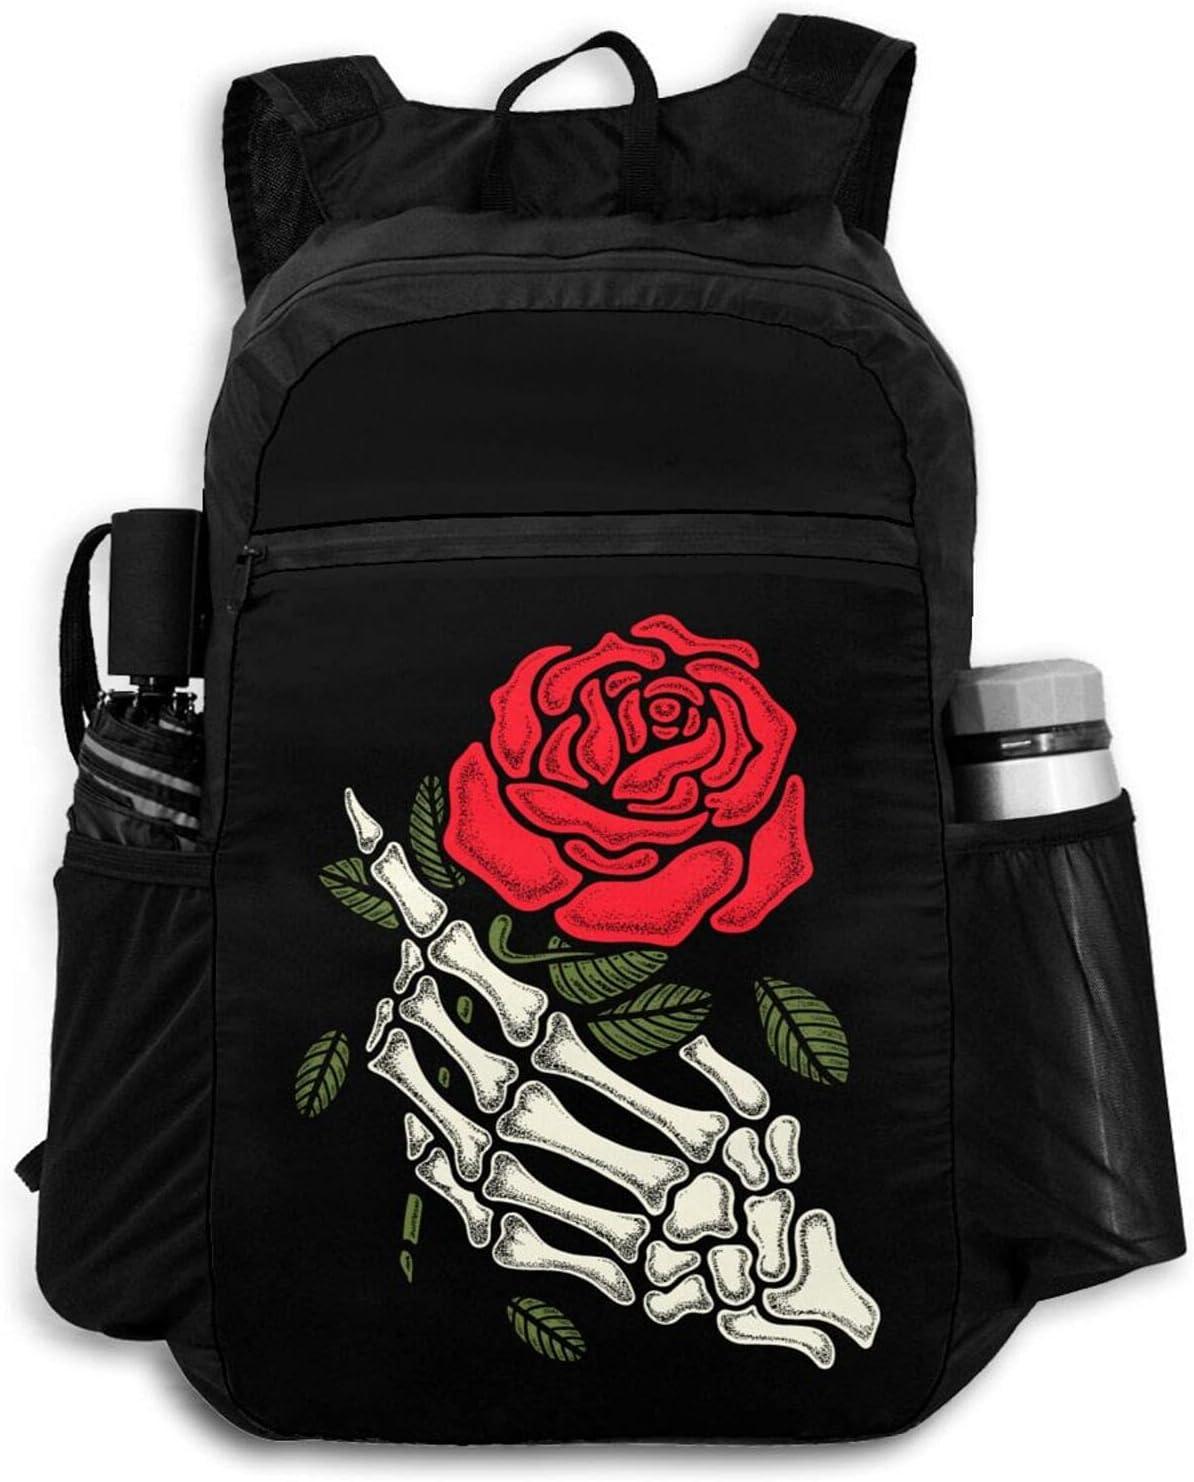 Zolama Skeleton Max 62% OFF Rose Backpacks for Women Men Cute San Jose Mall Daypa Packable